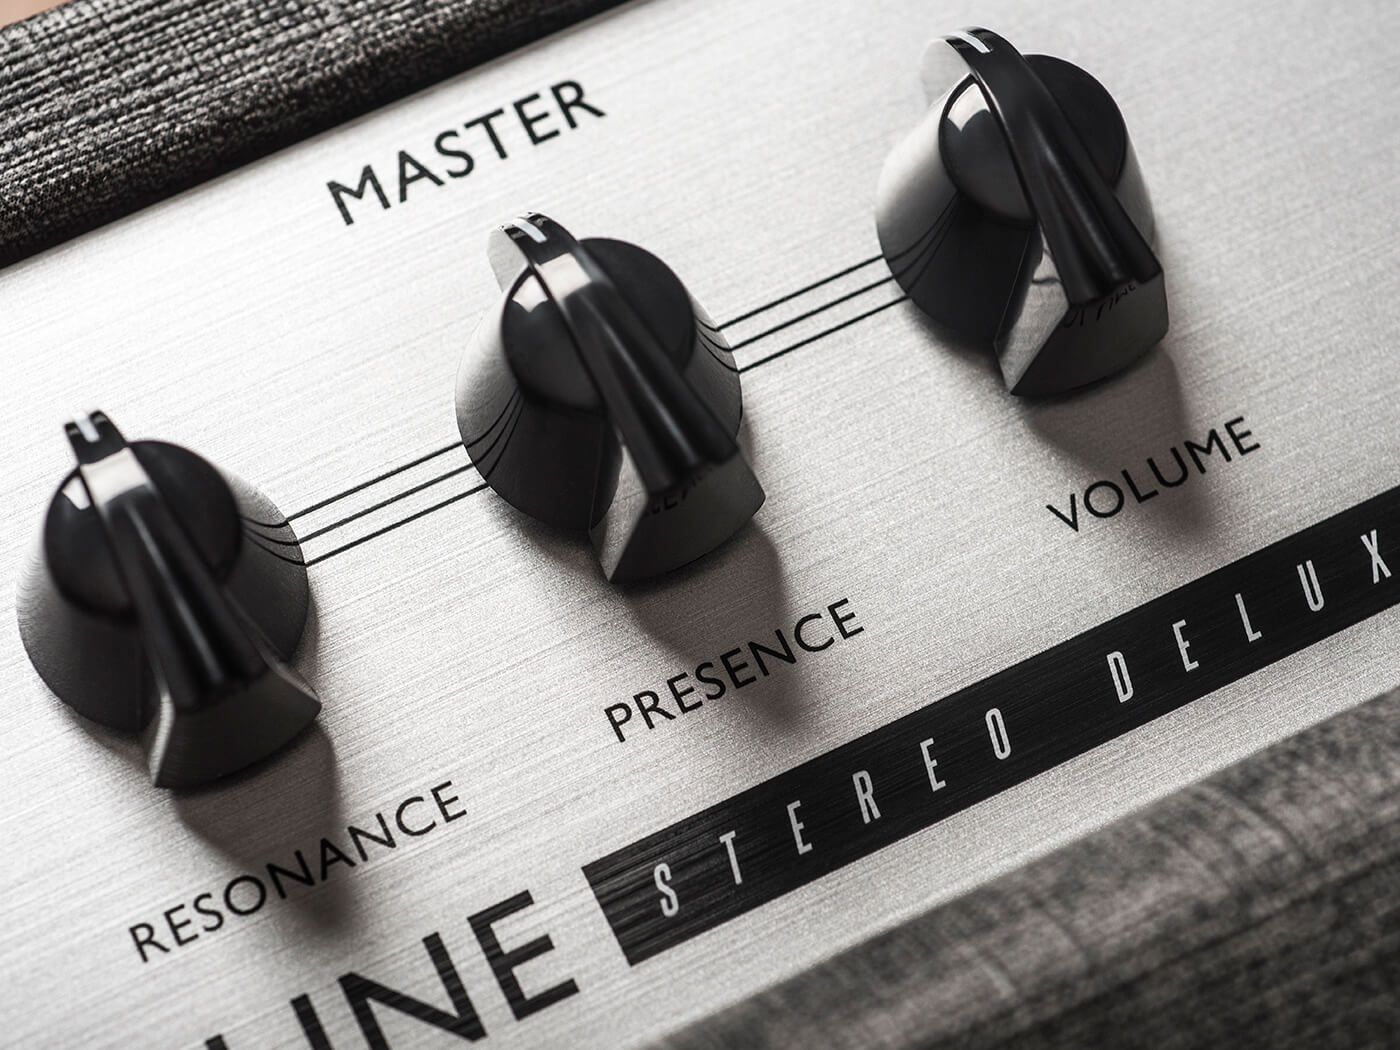 Blackstar Silverline Stereo Deluxe